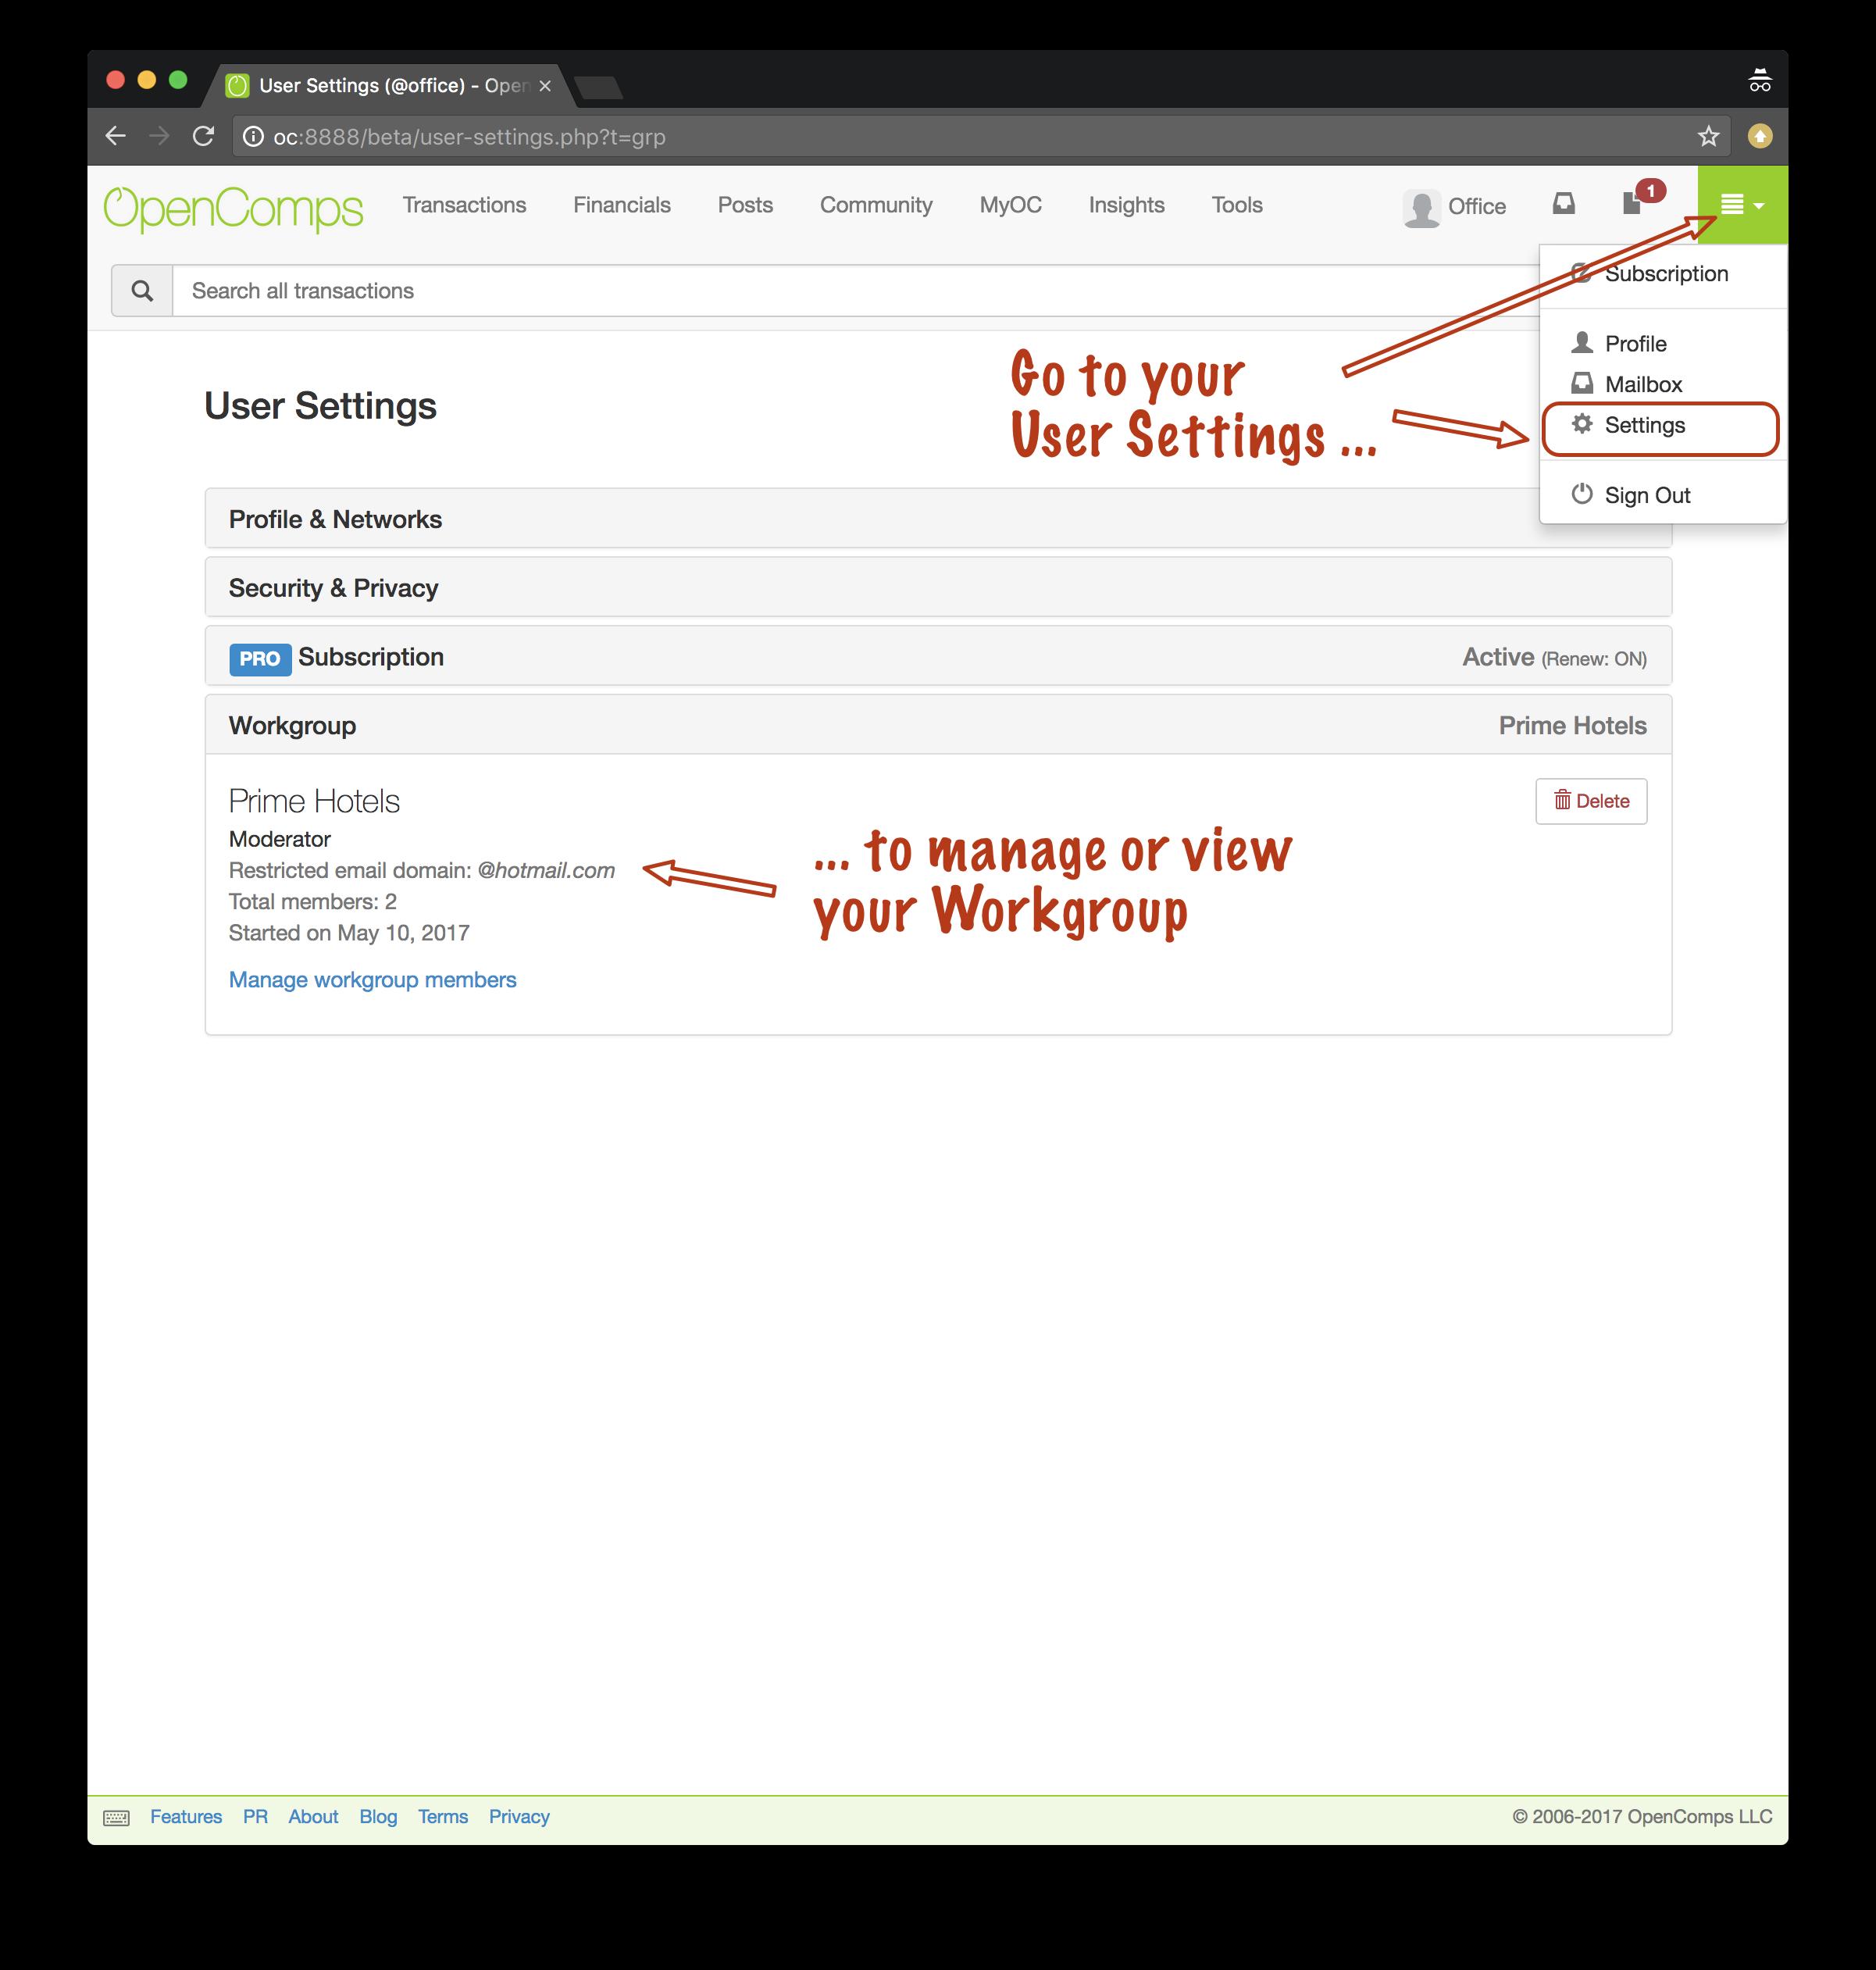 User Settings screen